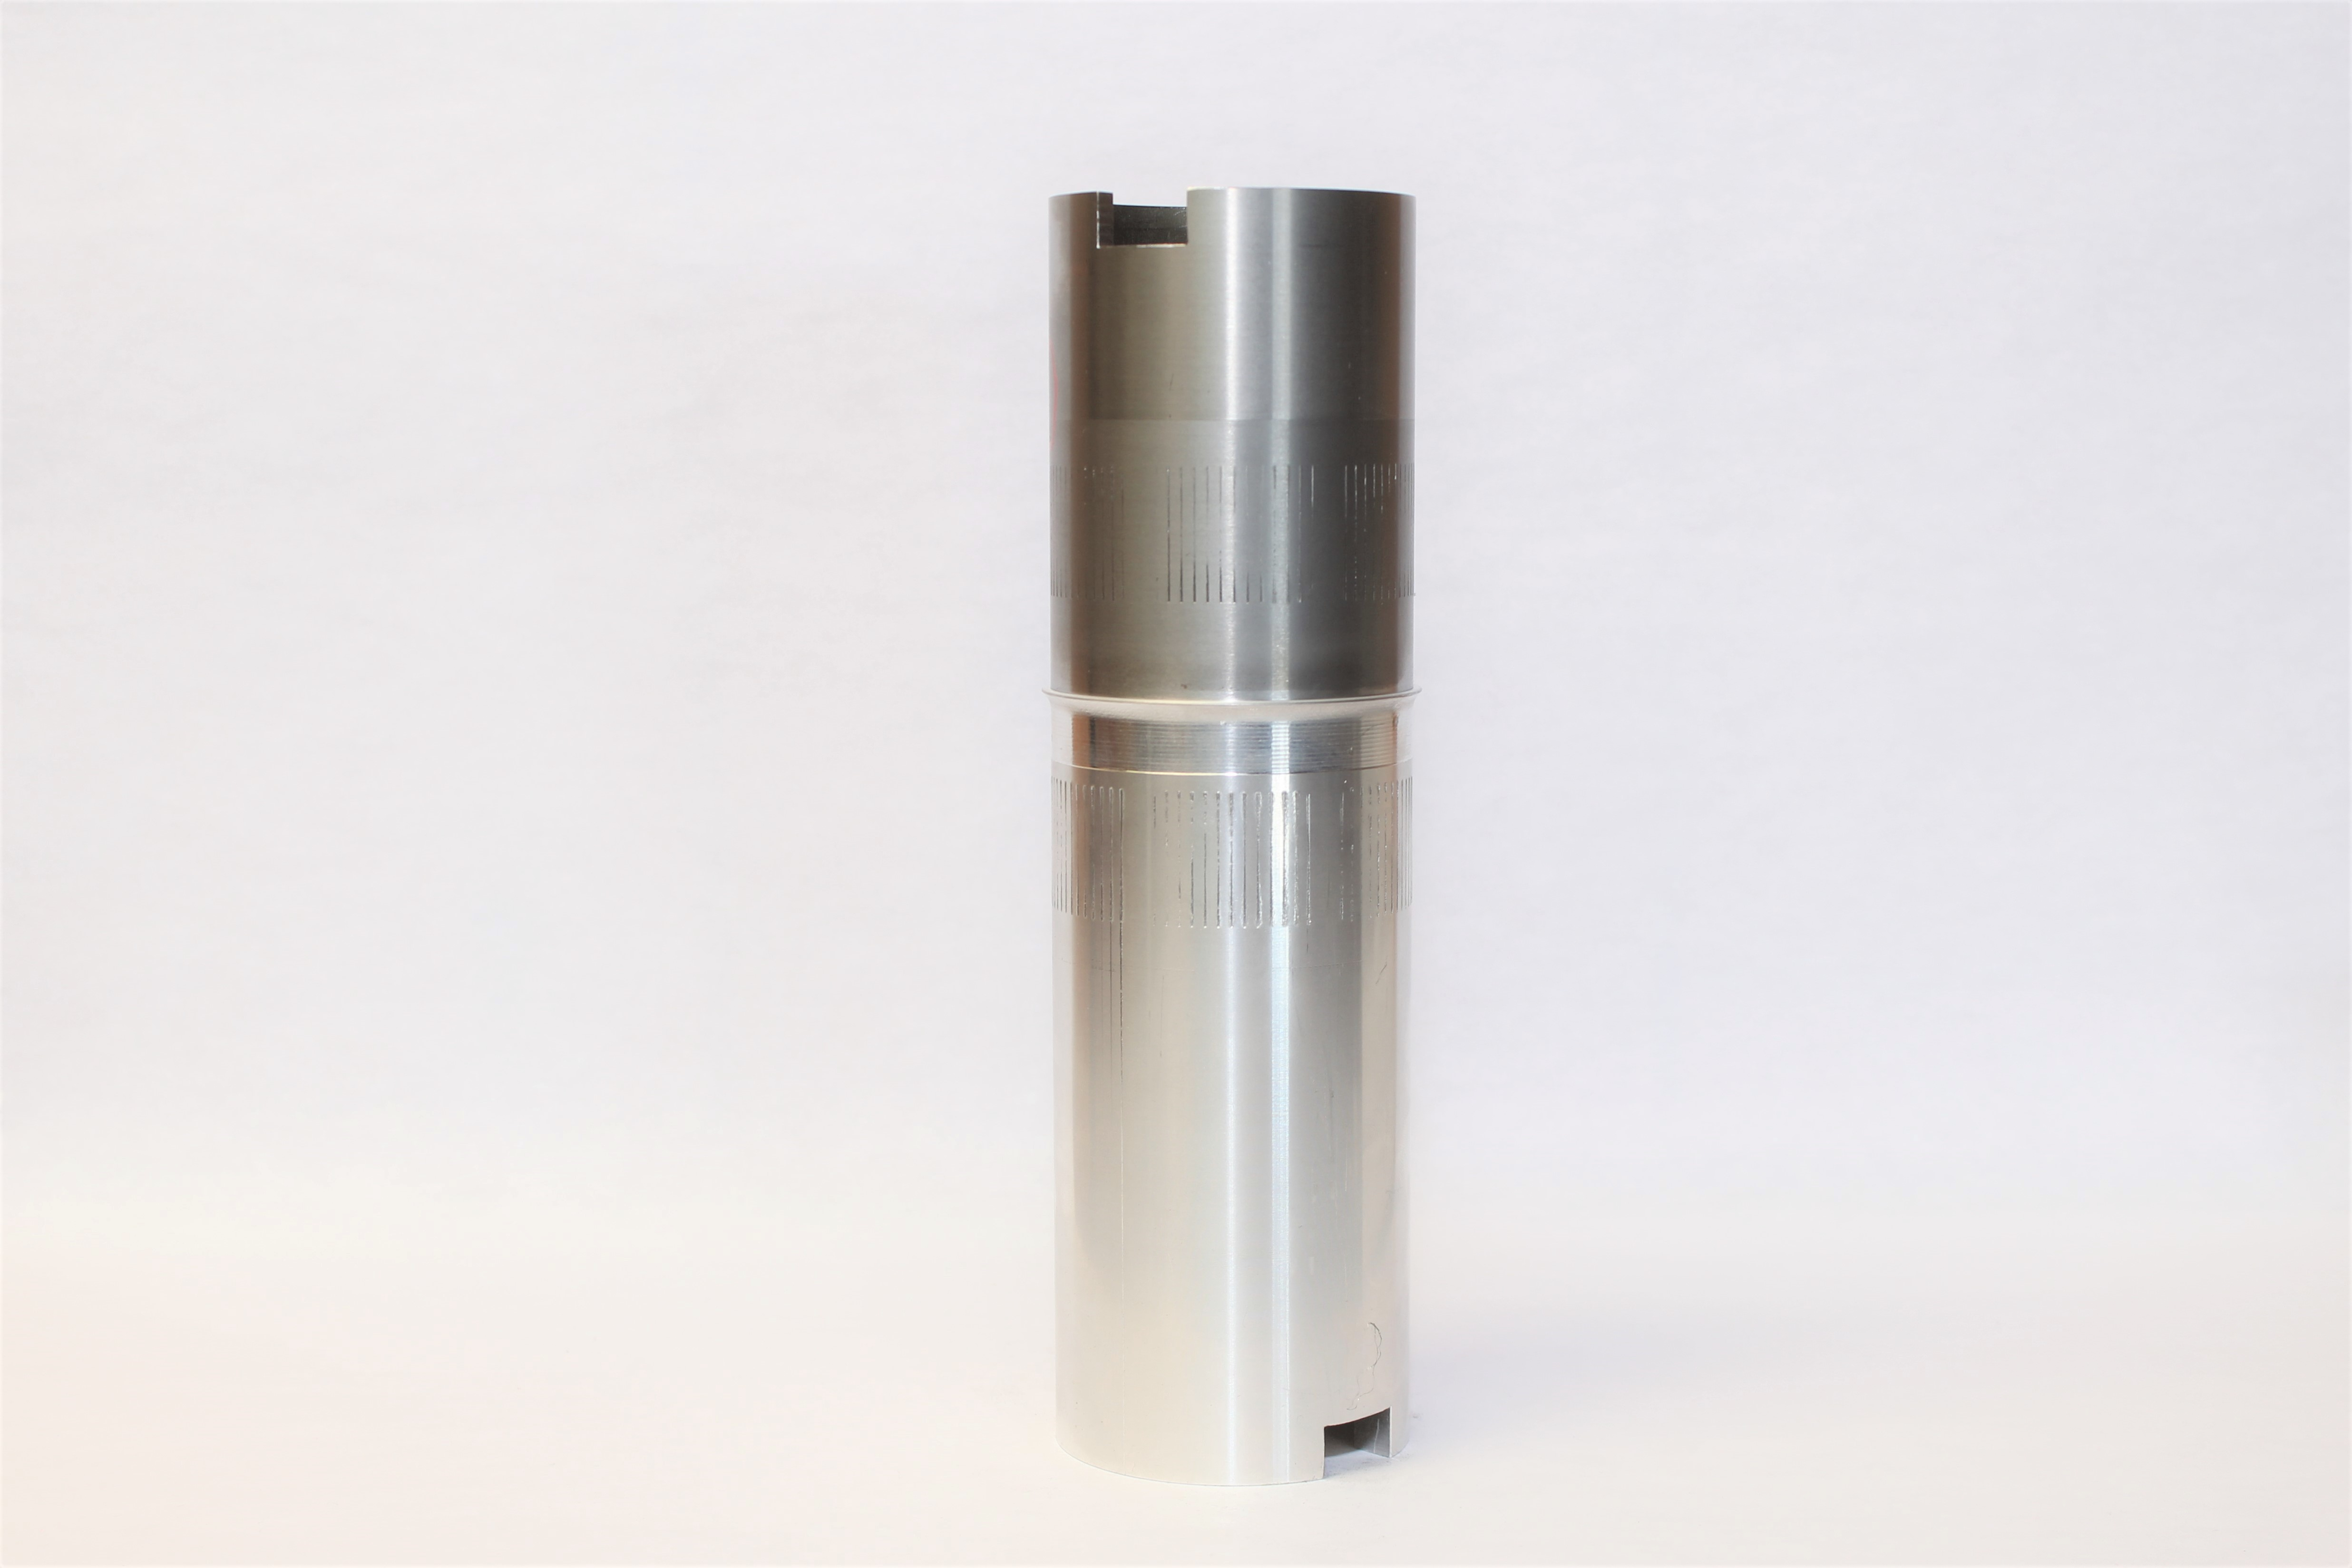 Bimetallic Weld Using Low Force Friction Welding MTI